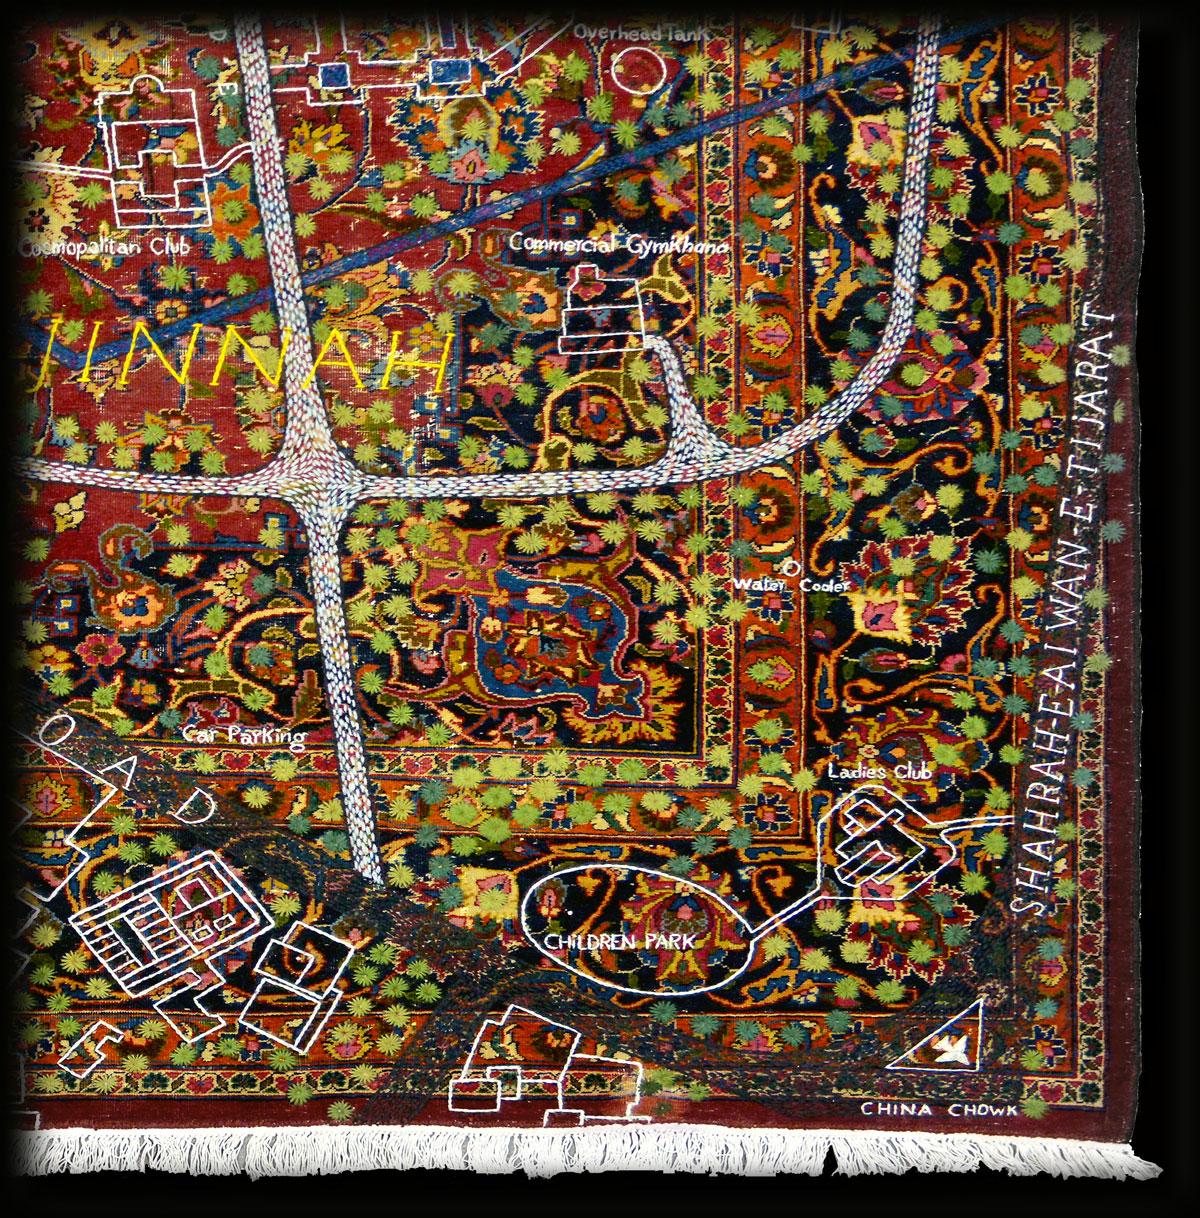 Artists - Karachi Biennale 2017